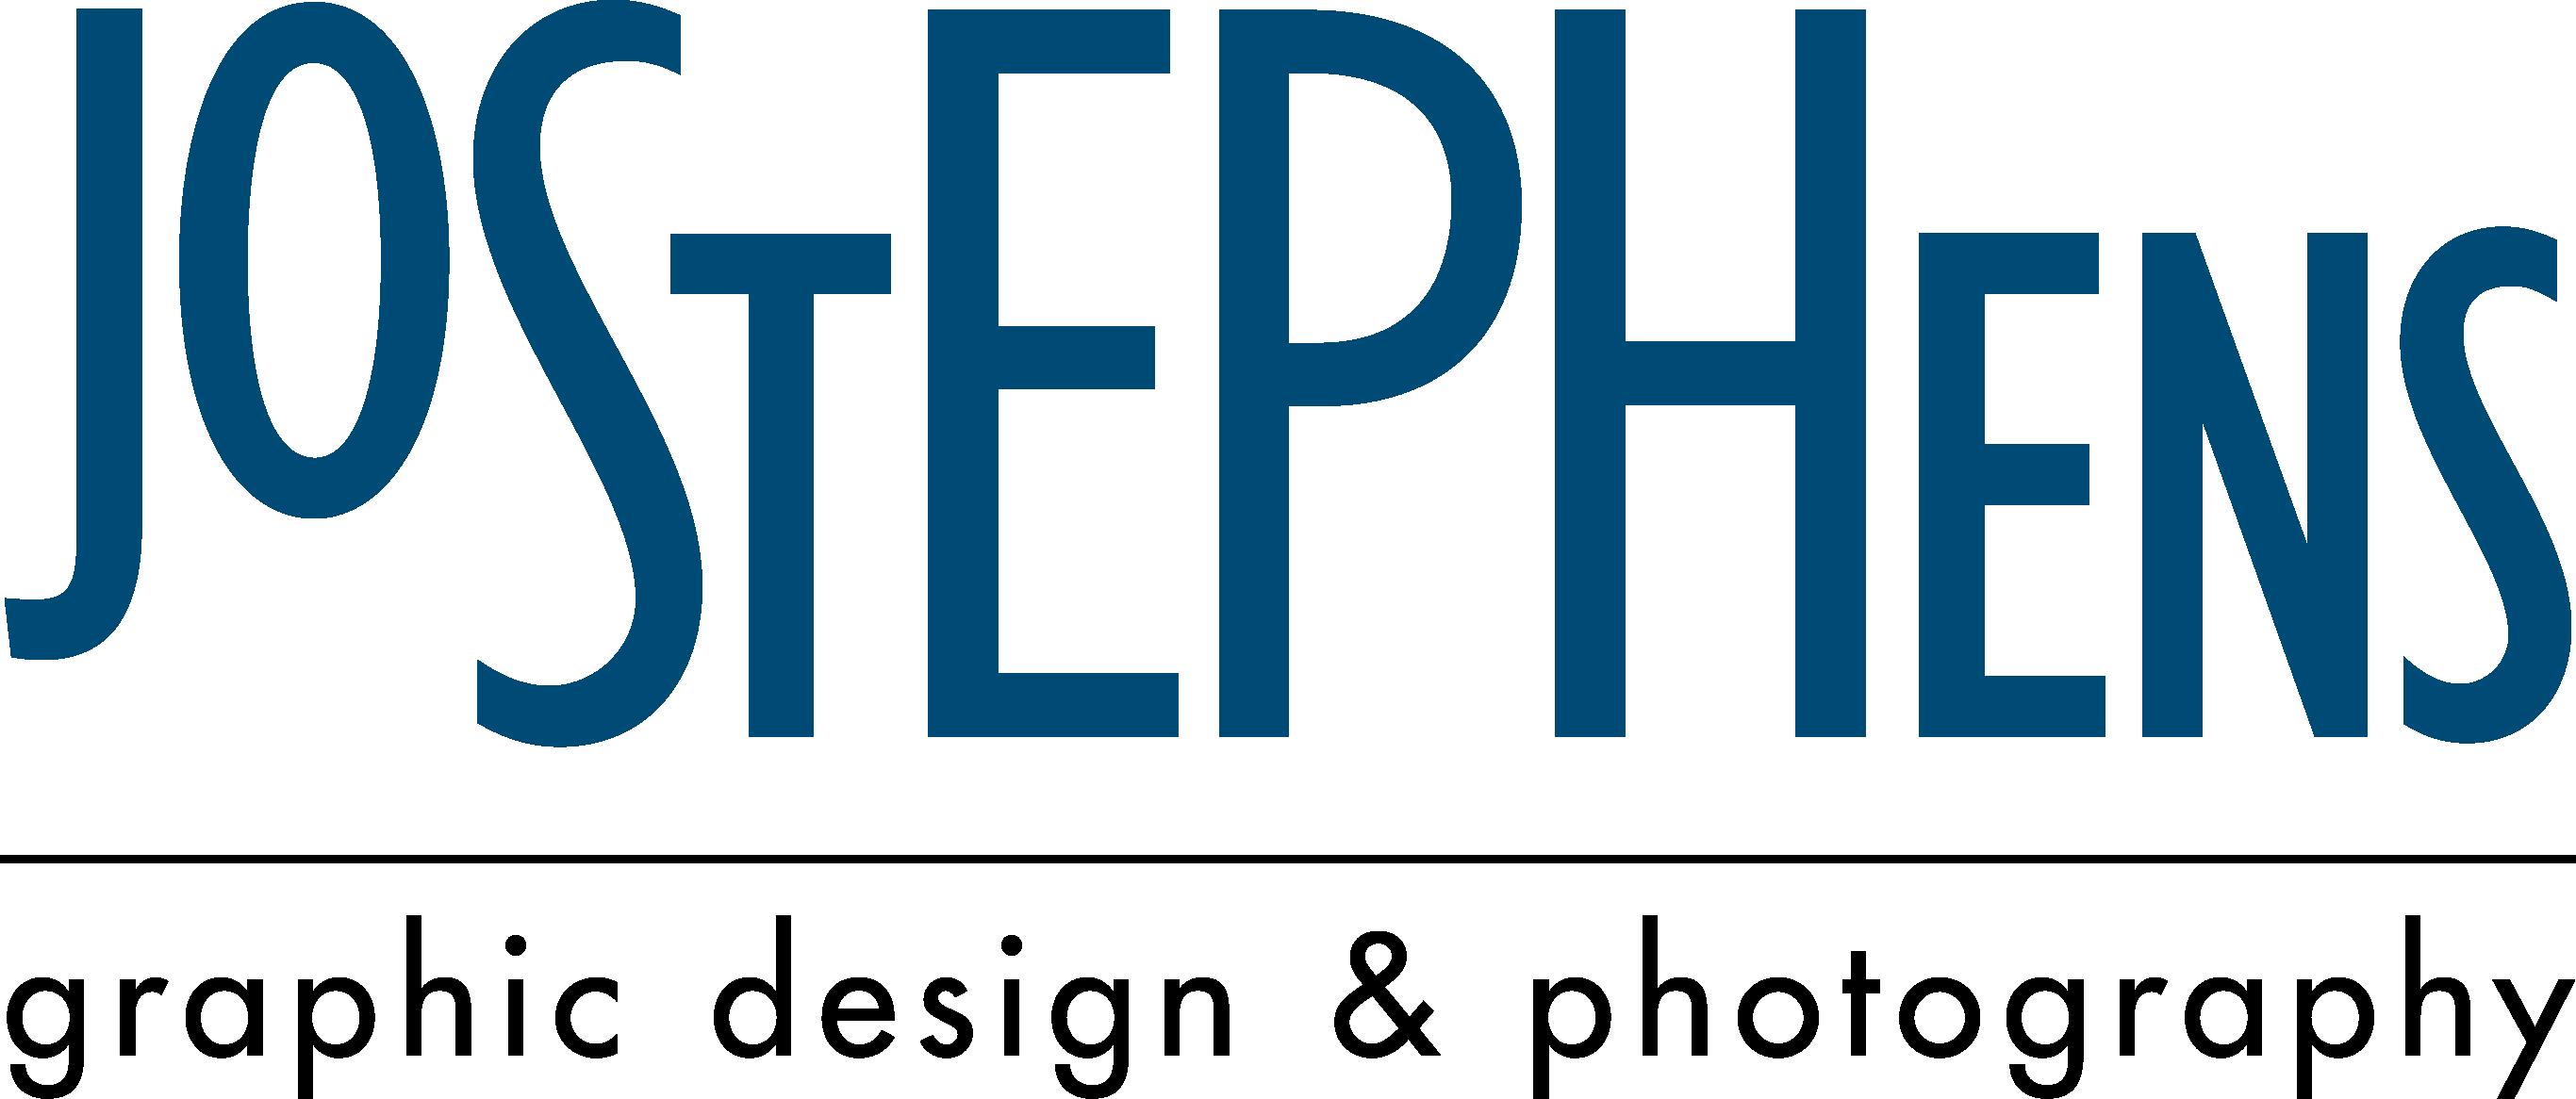 Joseph Stephens